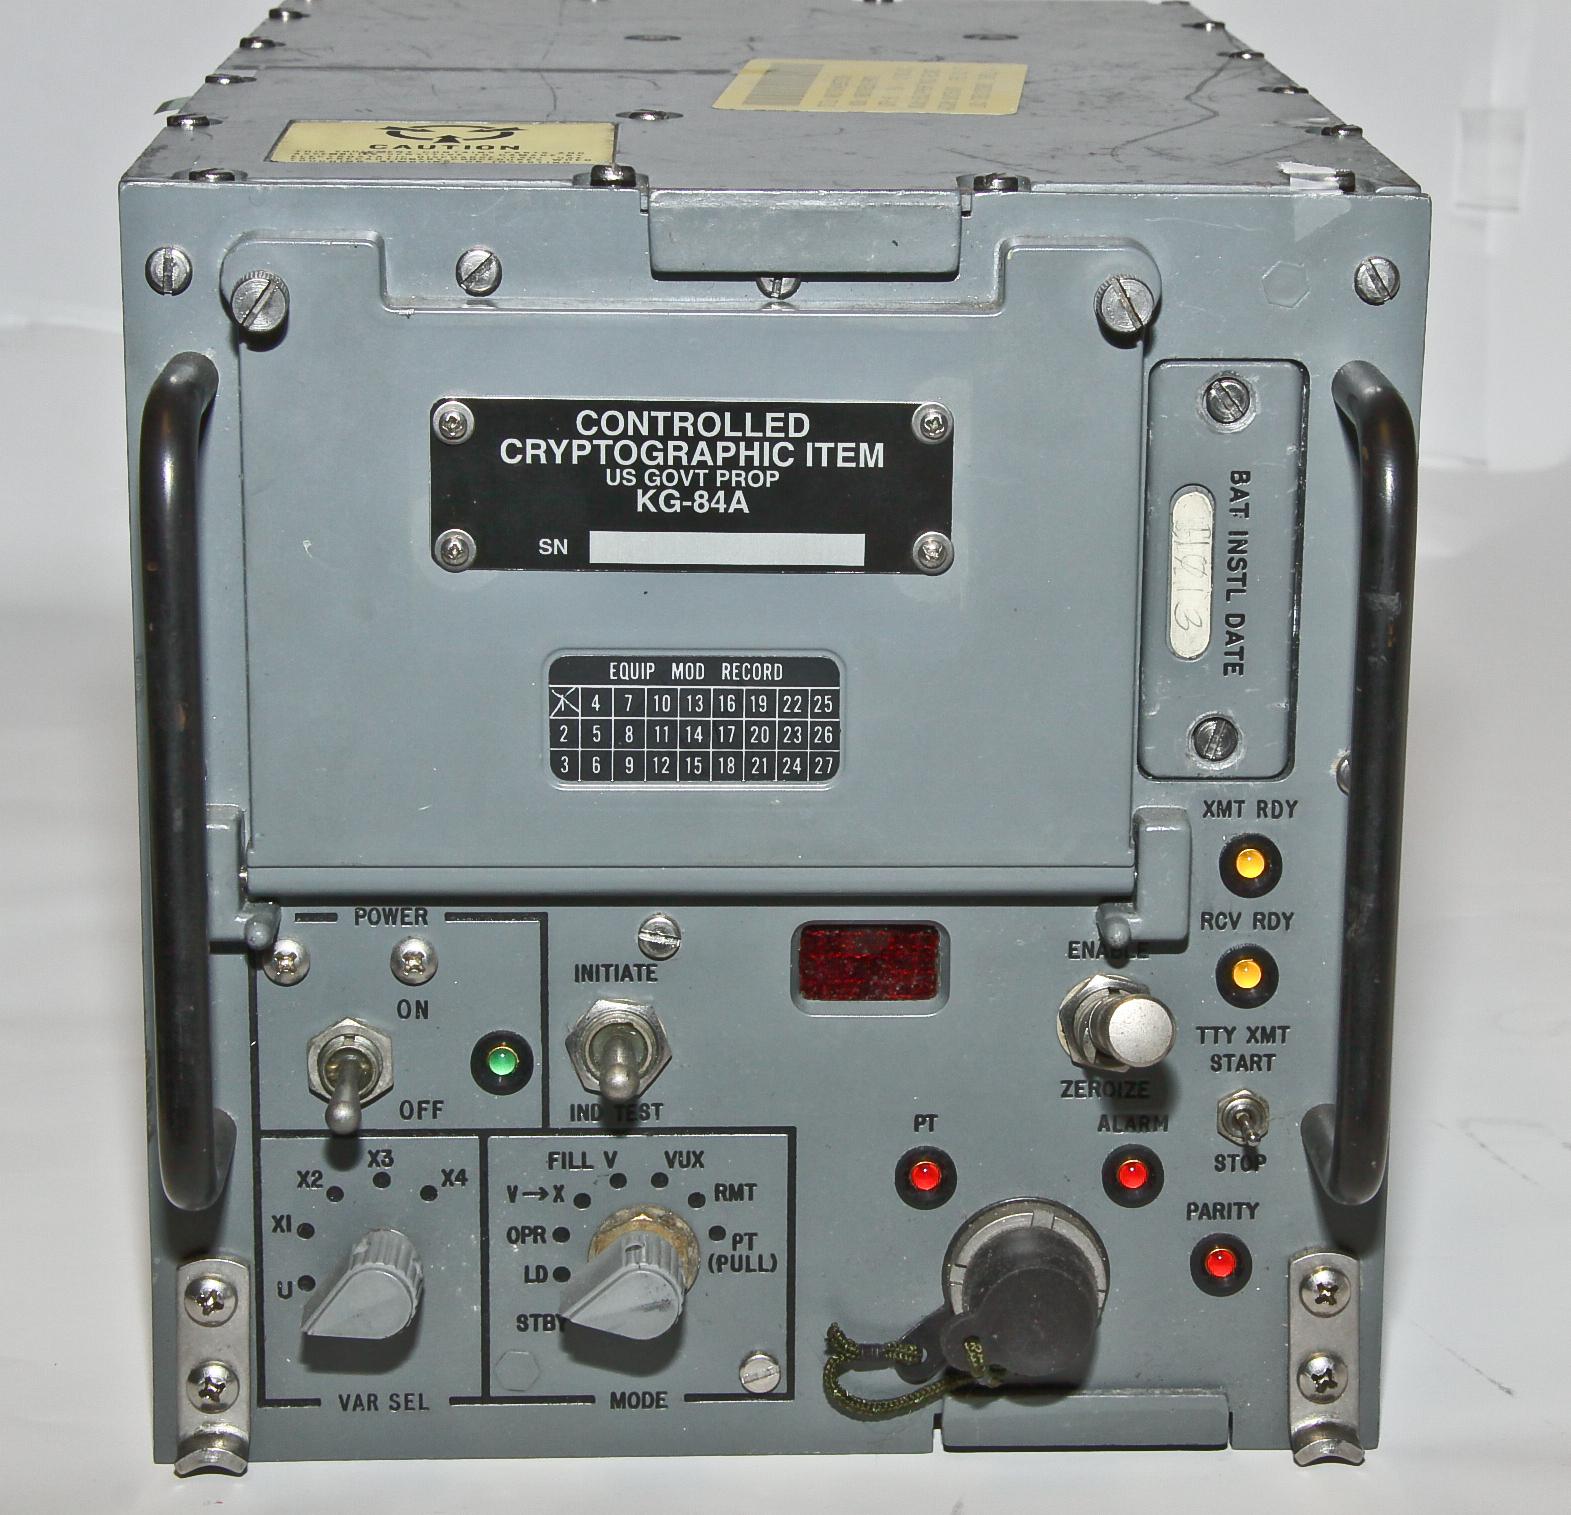 Image Credit: Glen's Computer Museum - http://www.glennsmuseum.com/encryption/encryption.html